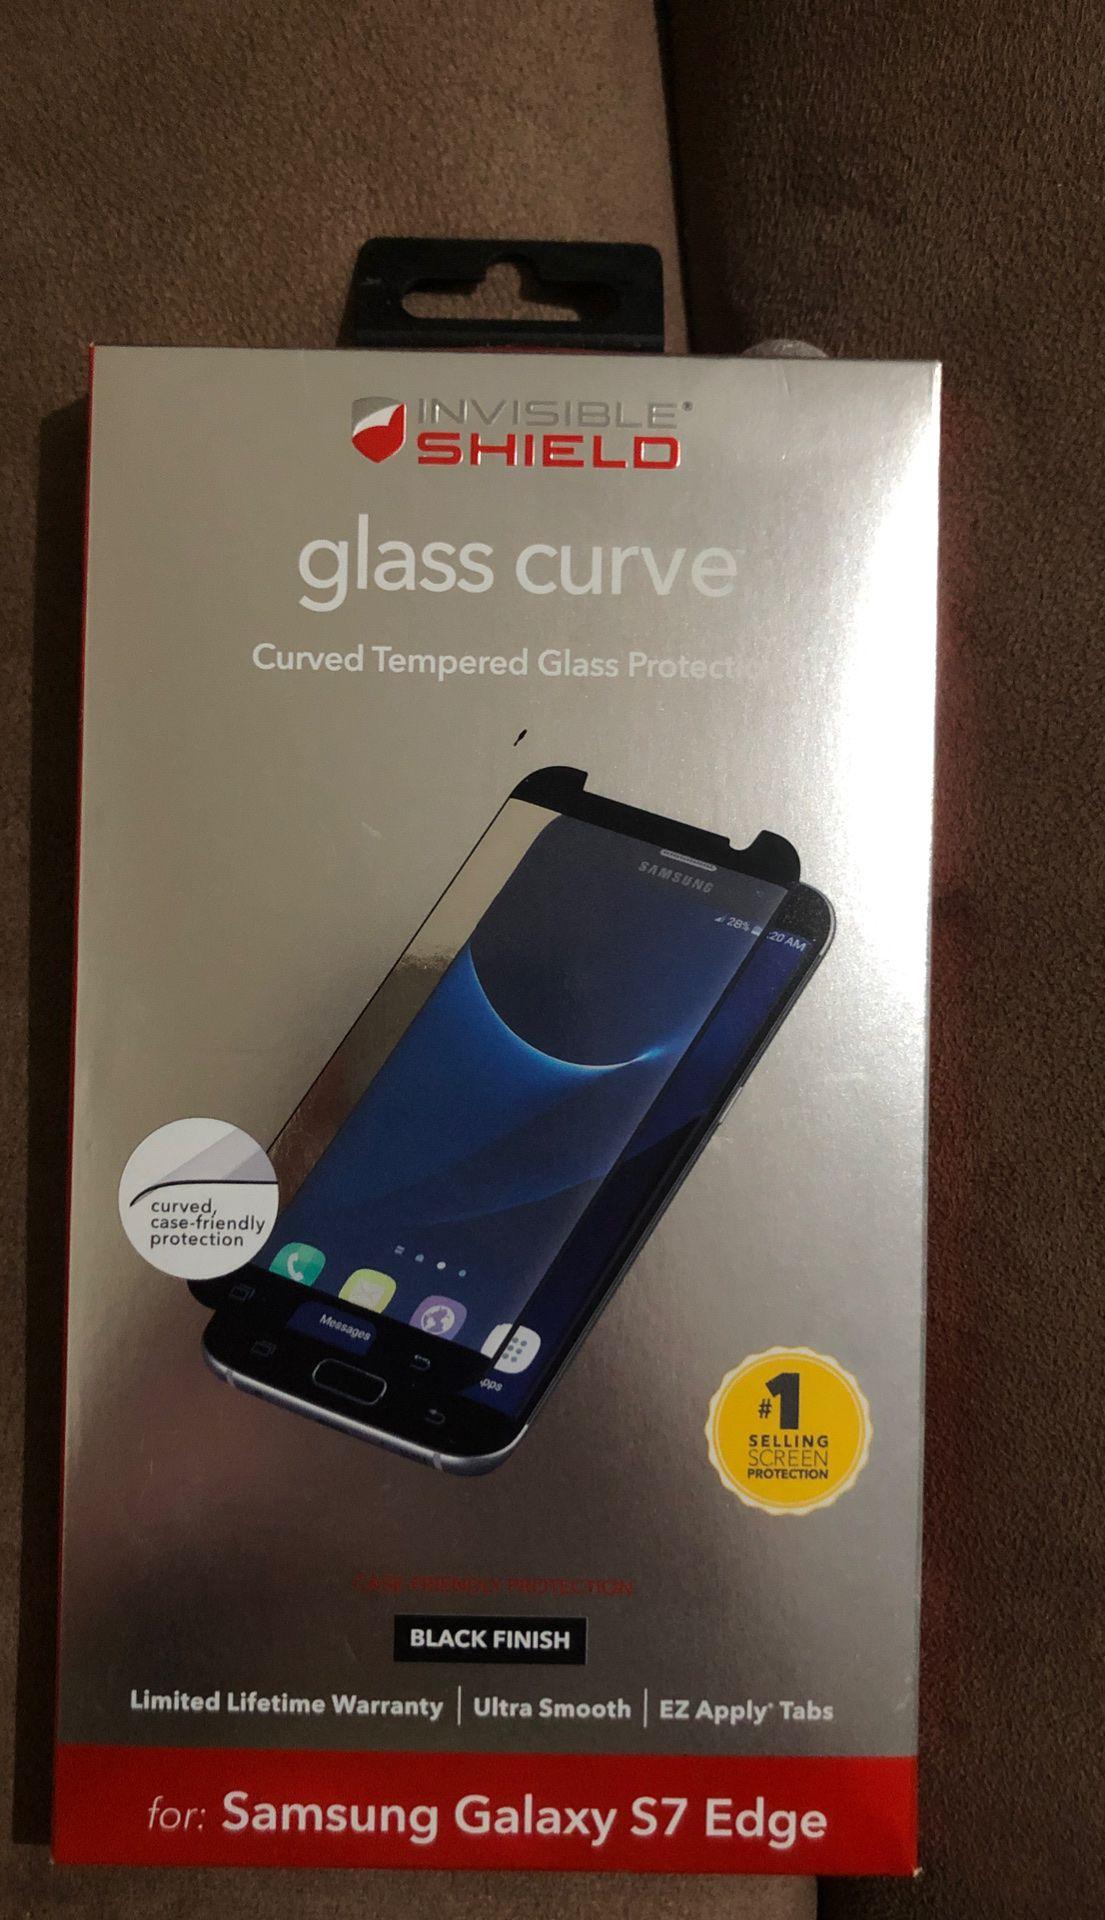 Invisible shield glass protector